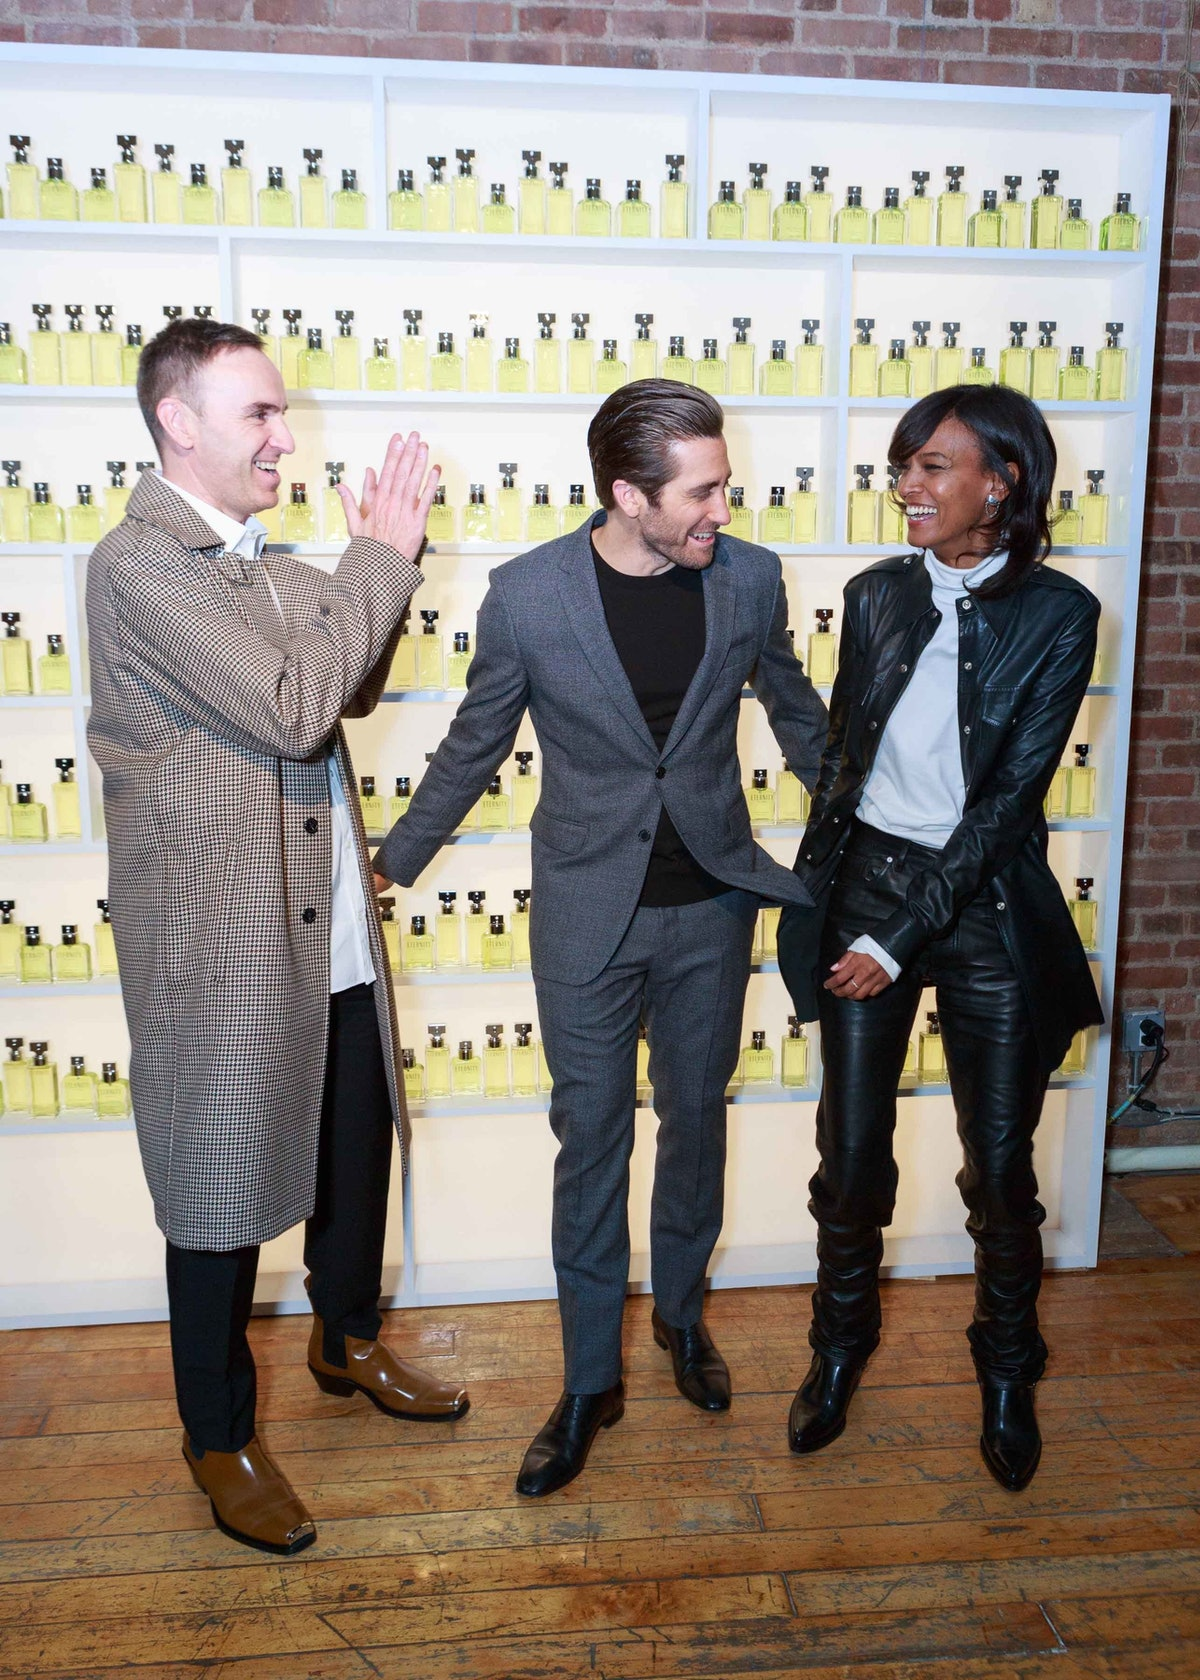 CALVIN KLEIN Hosts Private Dinner to Celebrate :New Faces of ETERNITY CALVIN KLEIN Jake Gyllenhaal +...